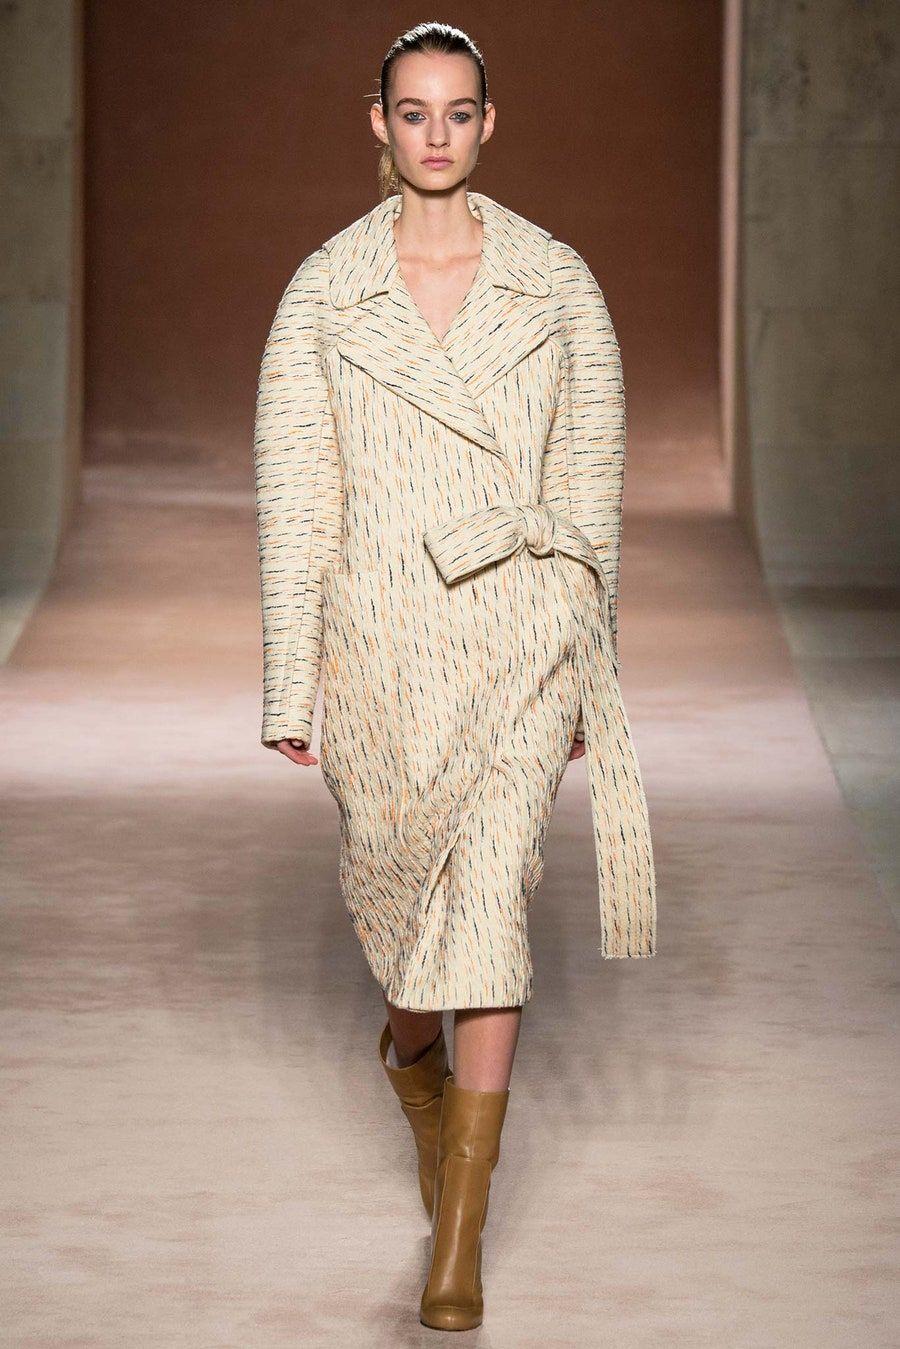 Victoria Beckham Fall 2015 ReadytoWear Fashion Show in